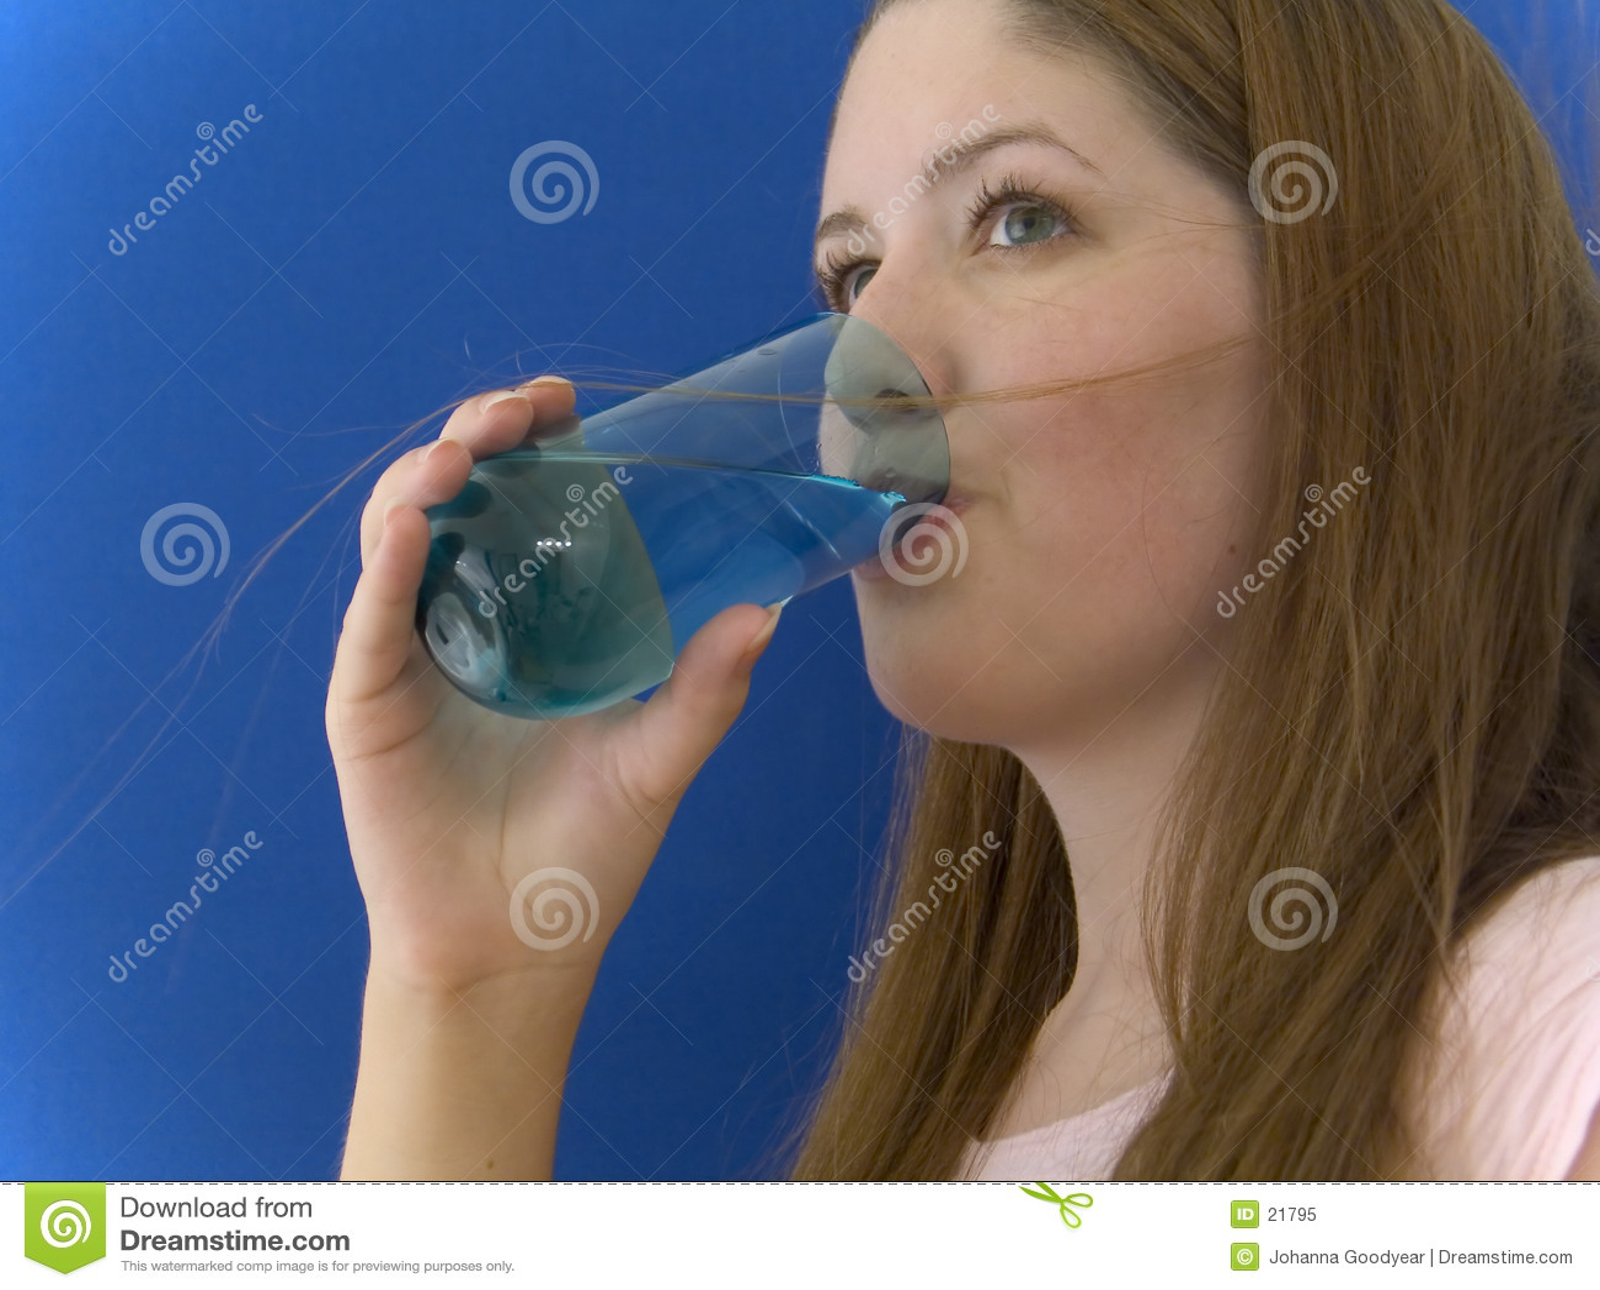 Thirsty 3